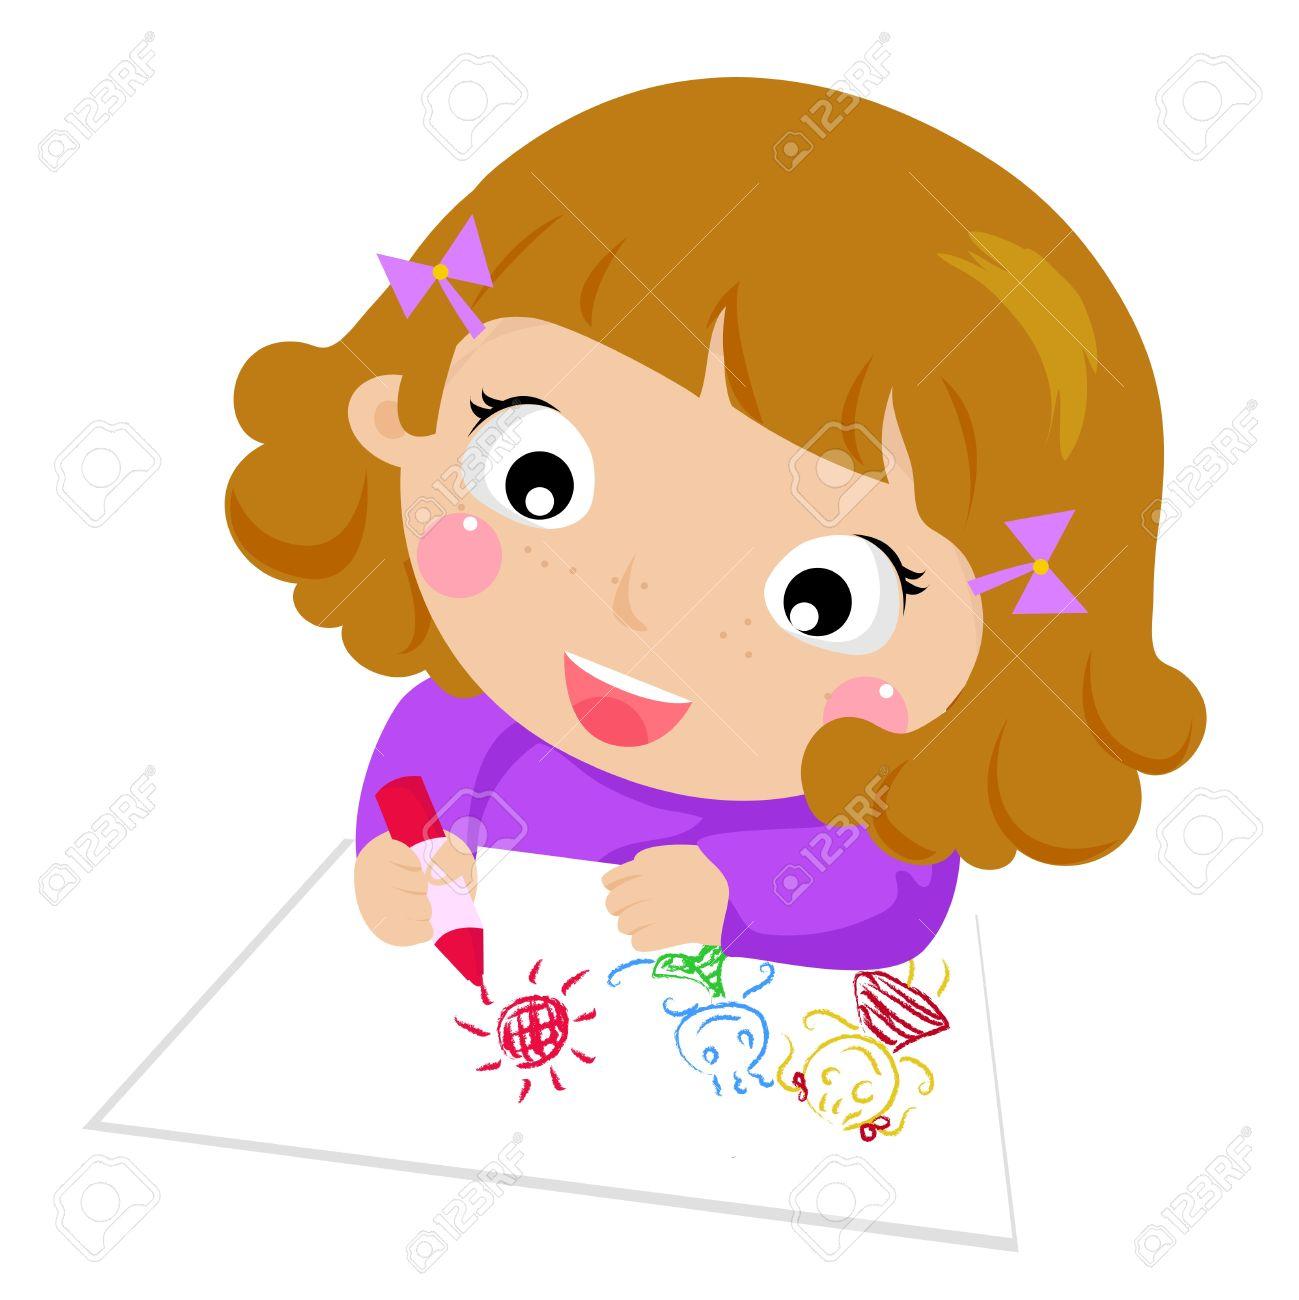 kids drawing stock vector 15170604 - Cartoon Drawings For Kids Free